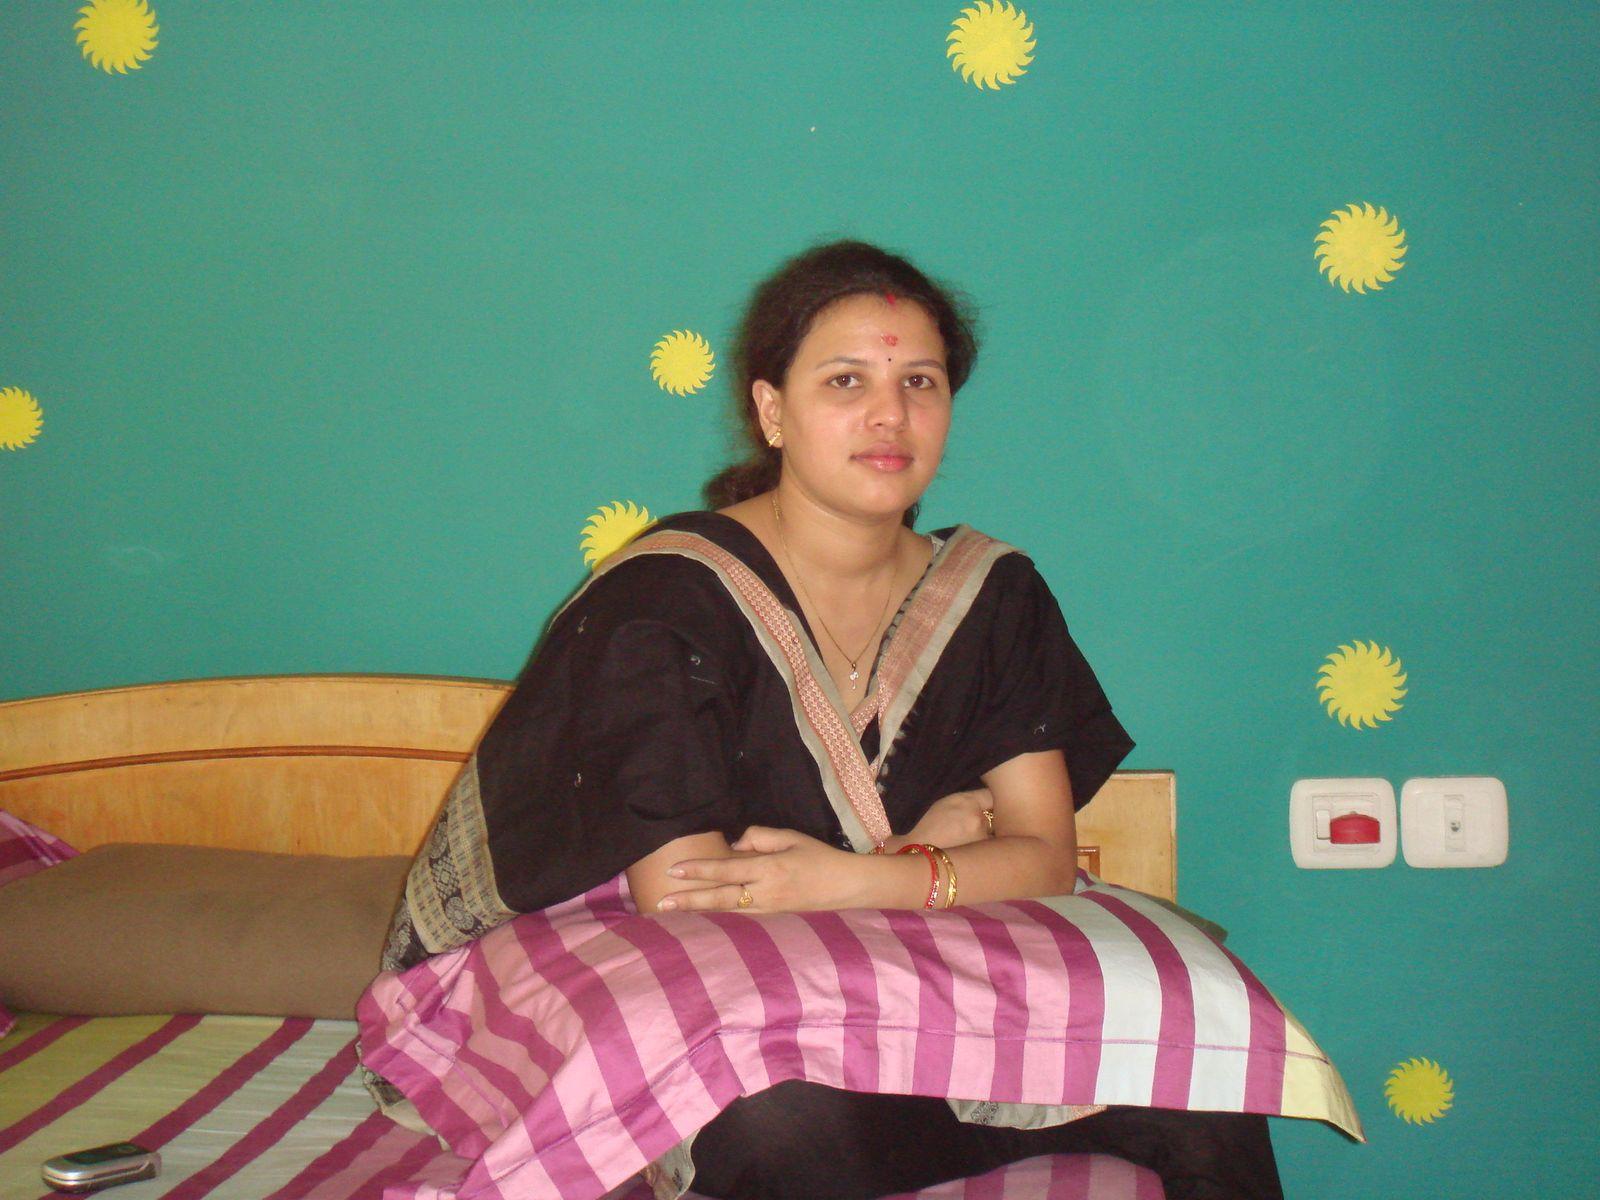 andhamina bhamalu : beautiful indian womens 5236